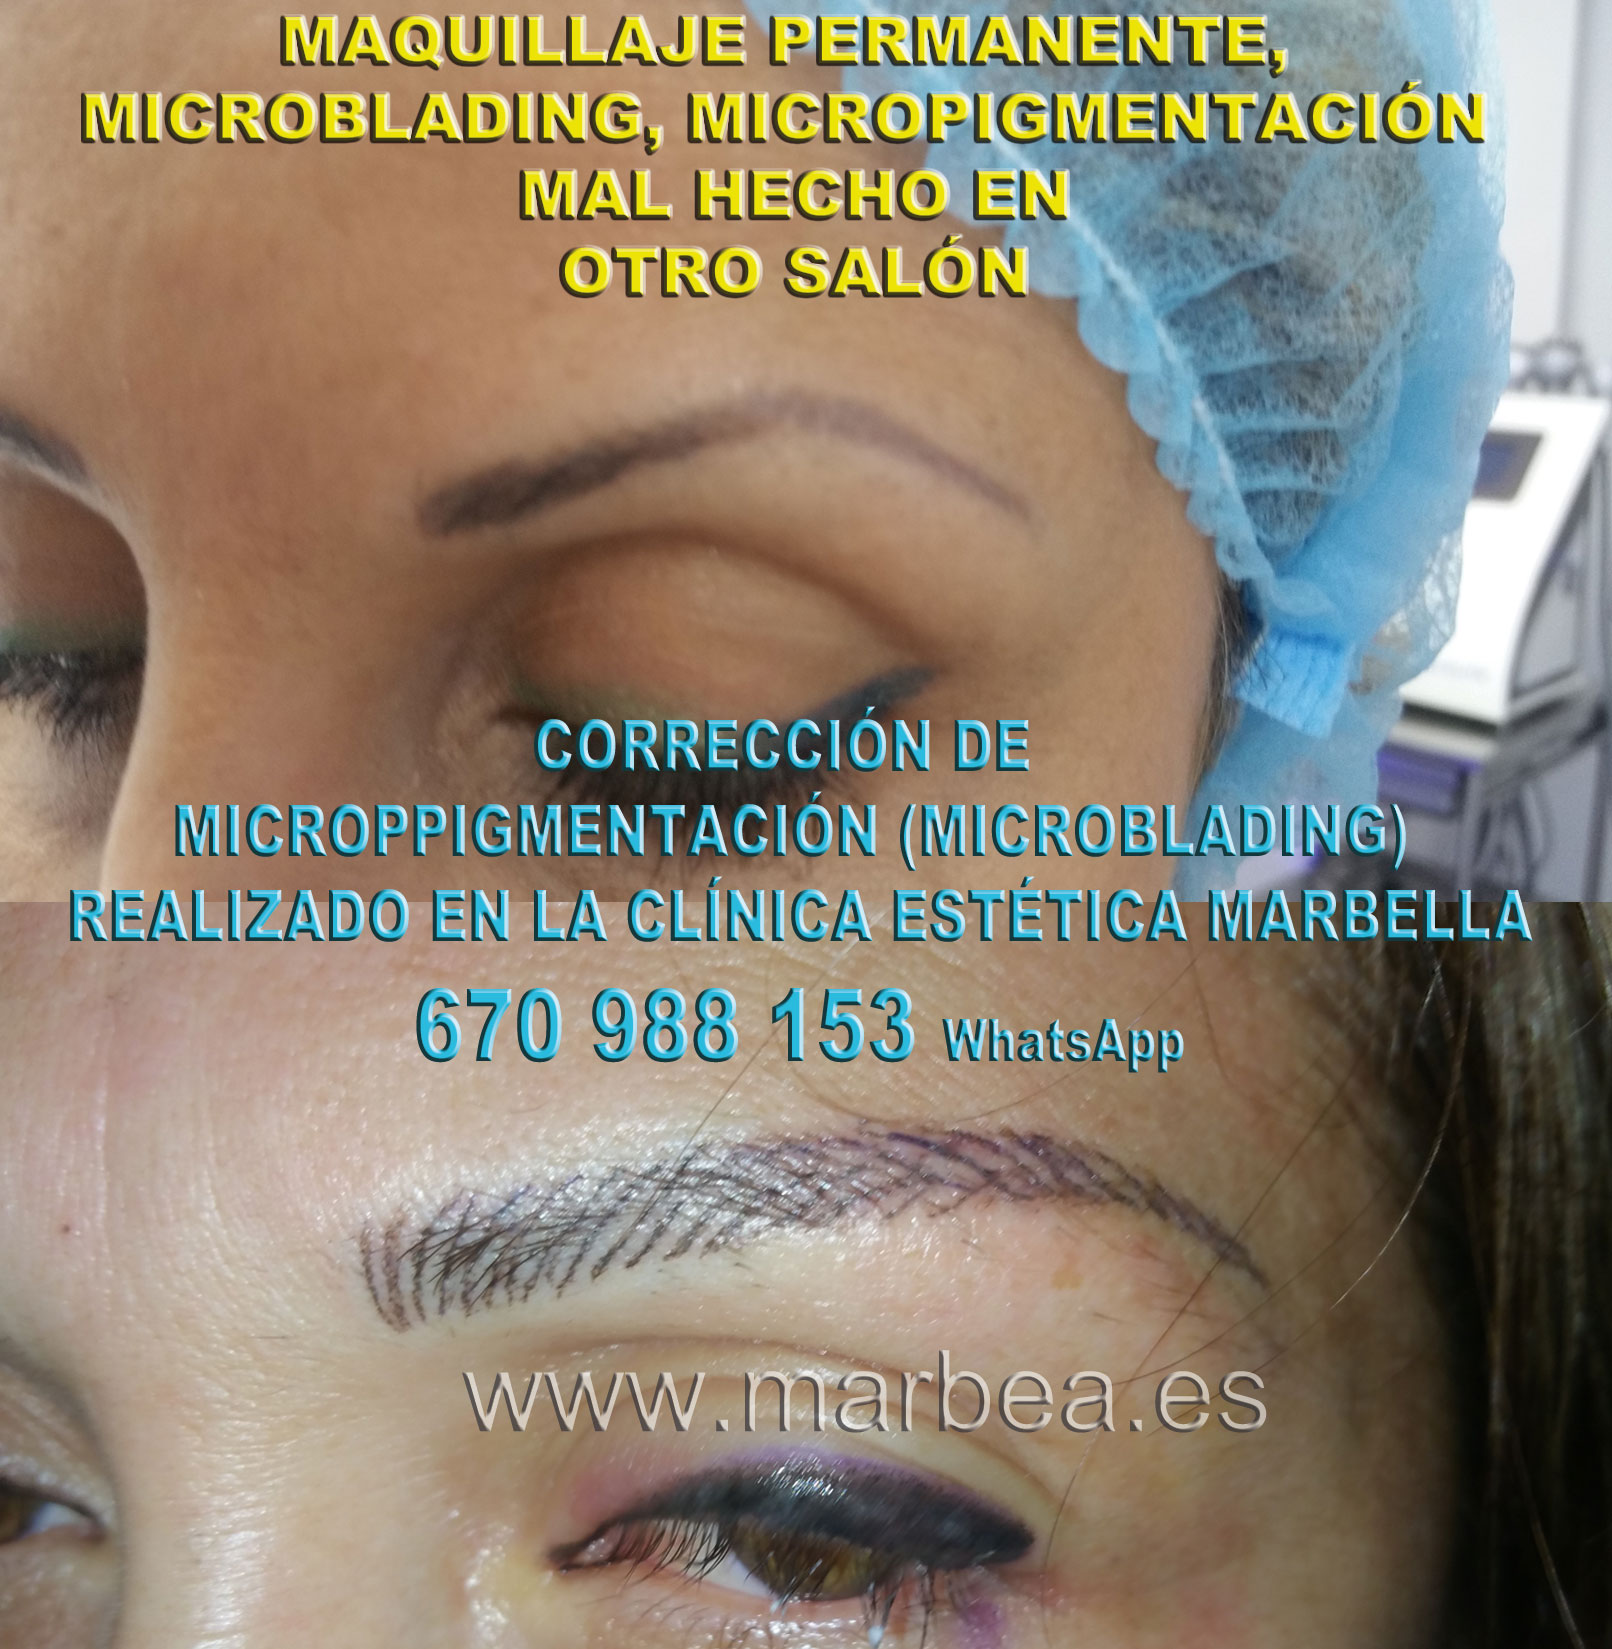 ELIMINAR TATUAJE CEJAS clínica estética tatuaje propone micropigmentacion correctiva de cejas,corregir micropigmentación mal hecha